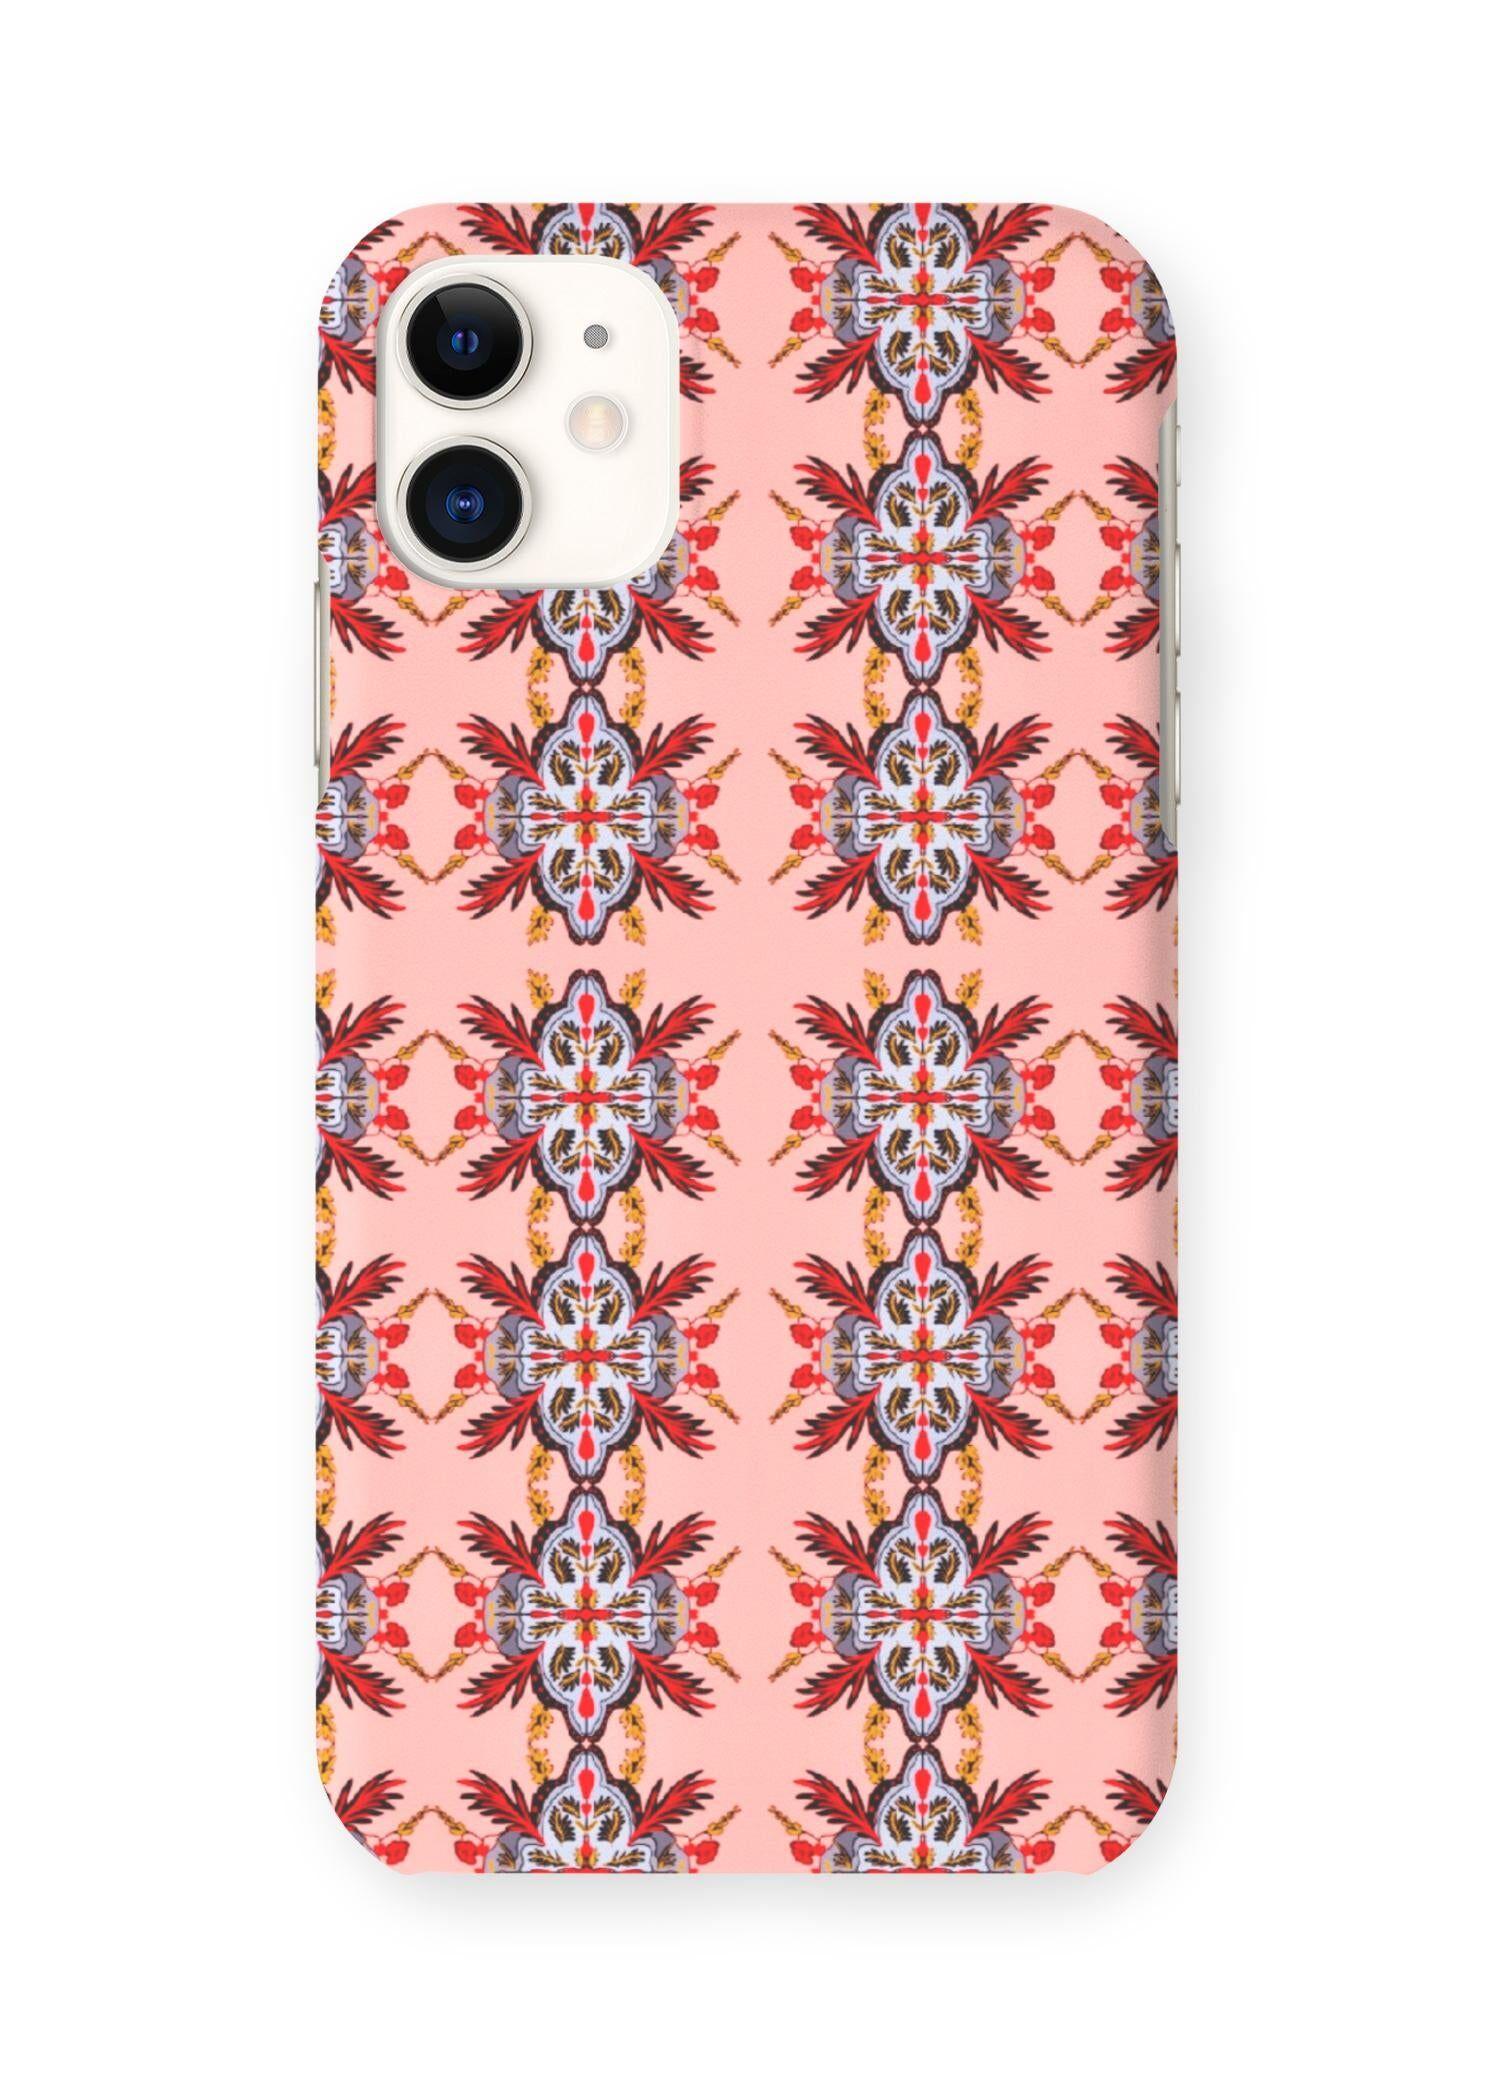 VIDA iPhone Case - Old Fashion by VIDA Original Artist  - Size: iPhone 11 / Ultraslim